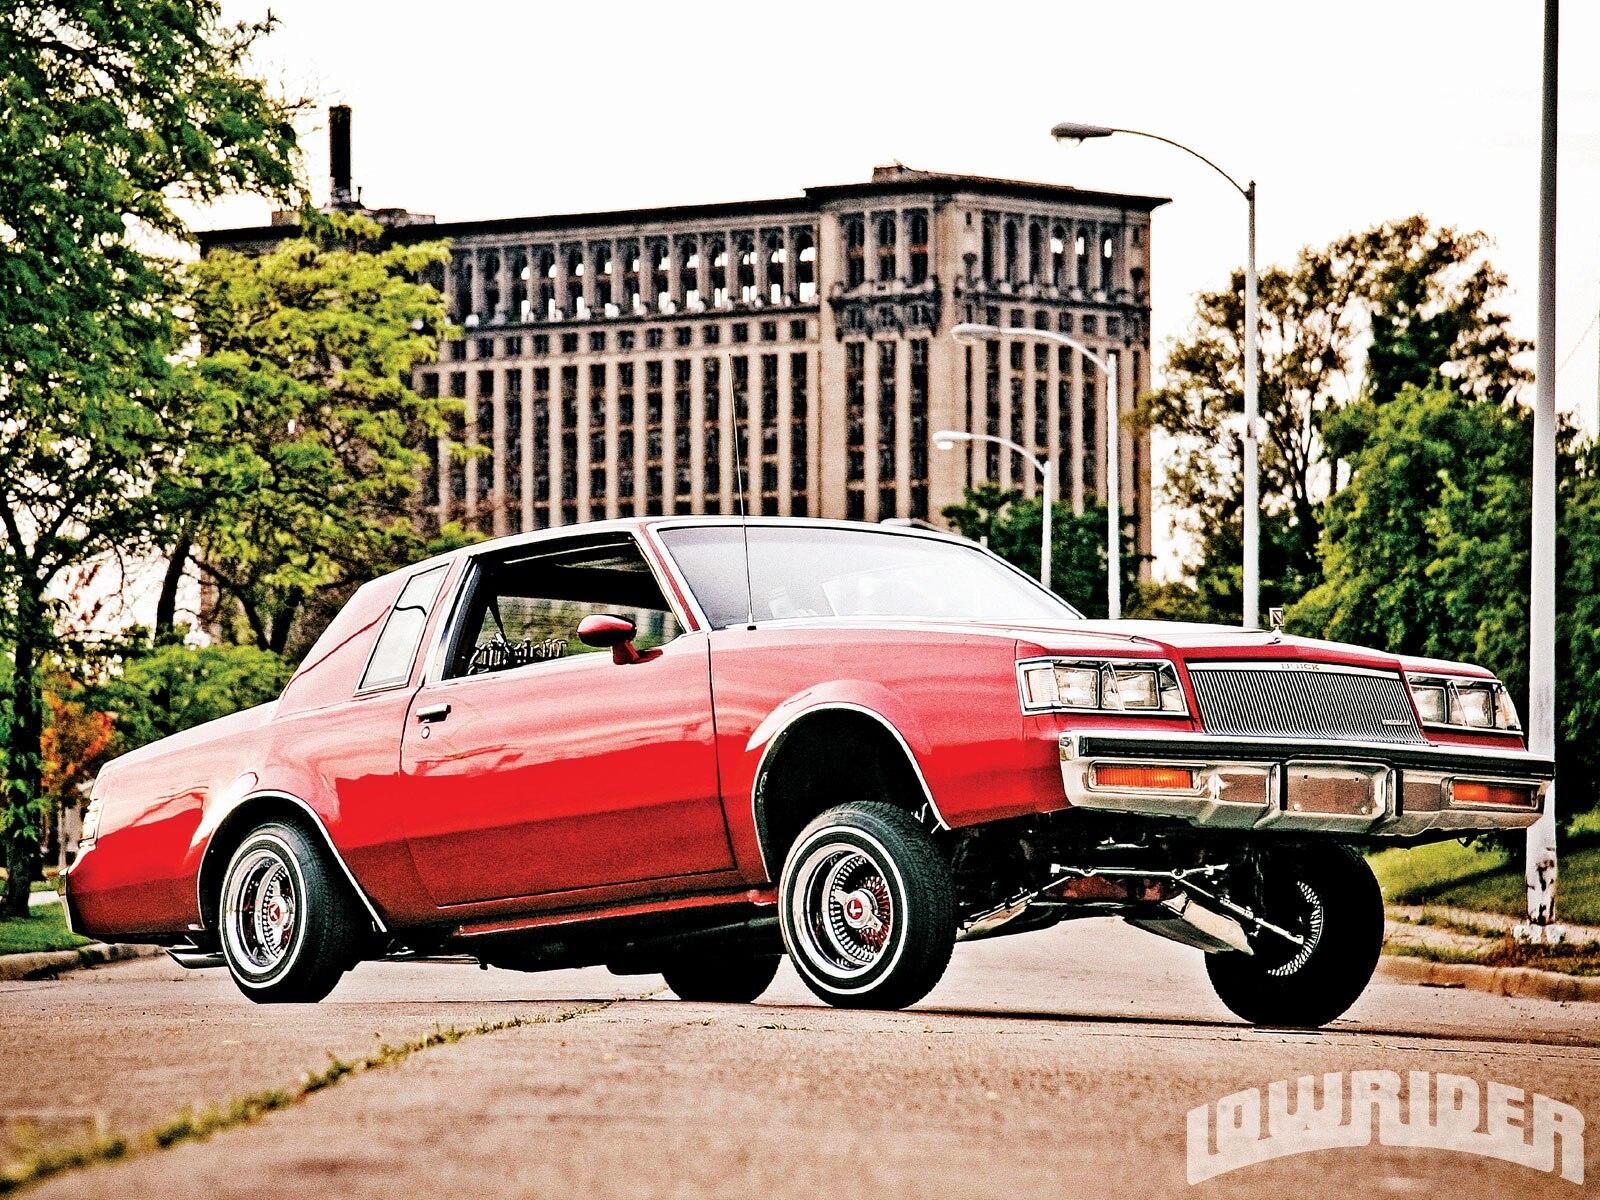 1986 buick regal chevy 362 engine lowrider magazine. Black Bedroom Furniture Sets. Home Design Ideas